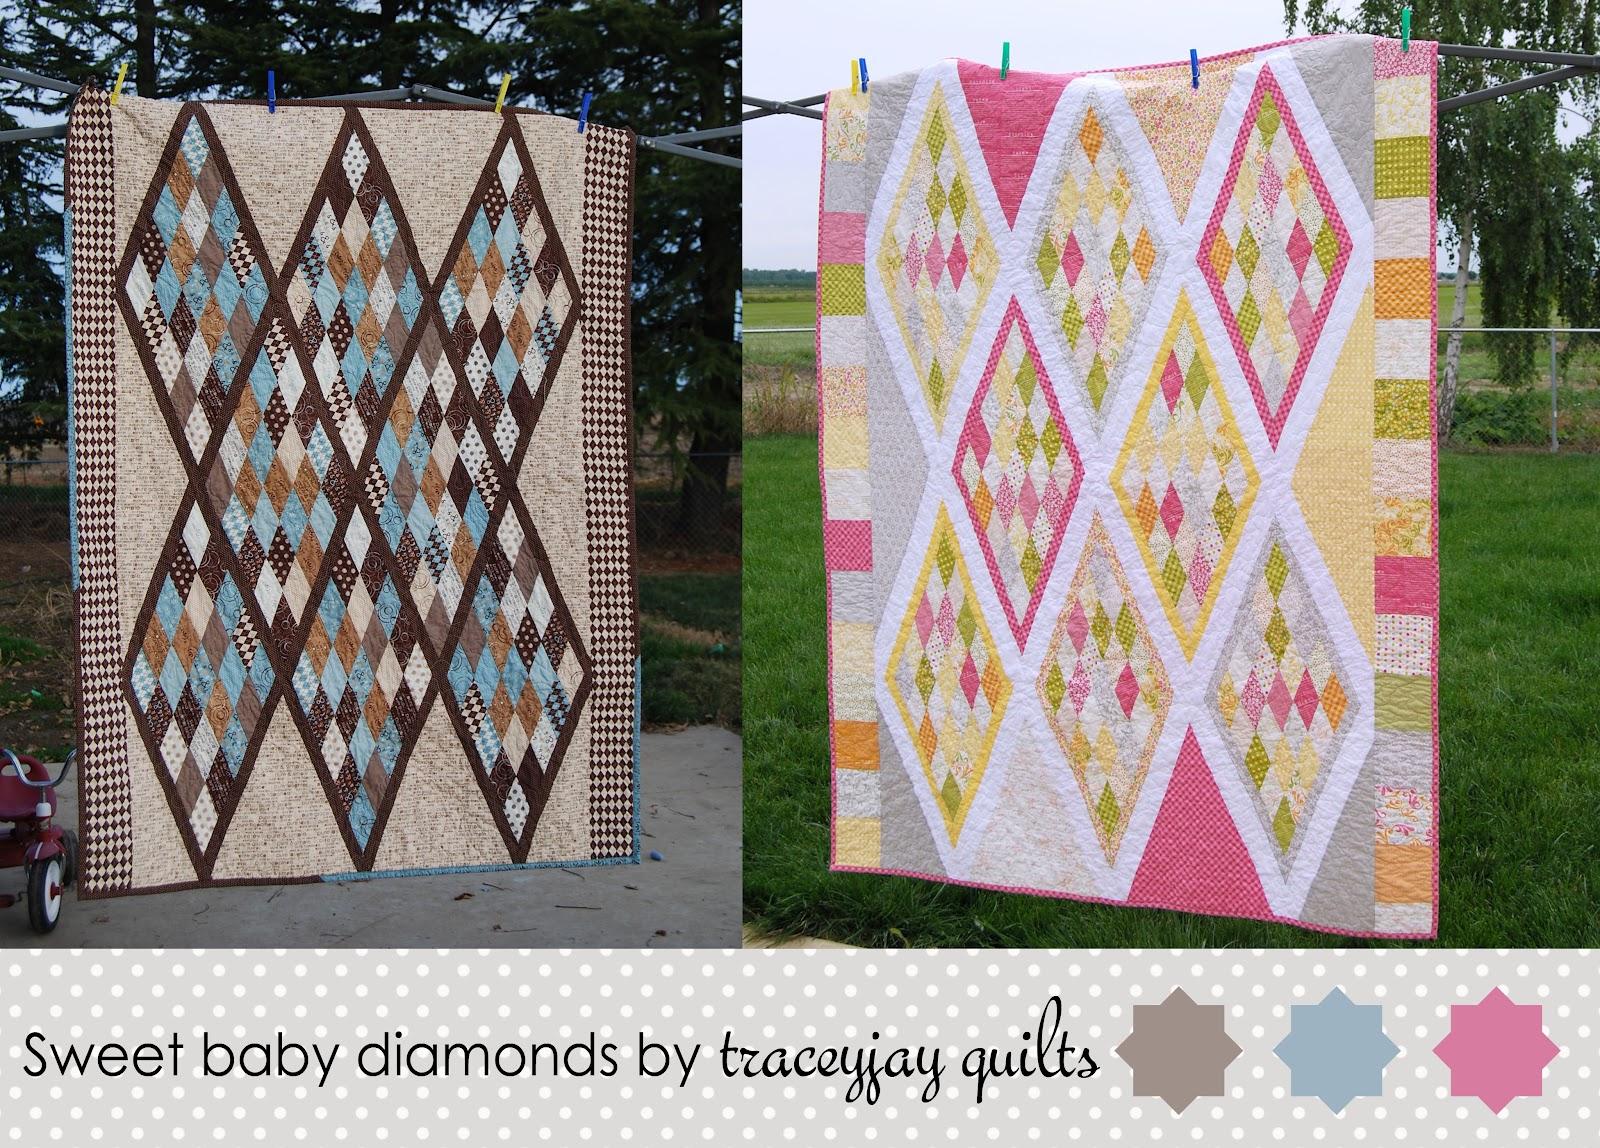 Sweet baby diamonds quilt moda bake shop sweet baby diamonds quilt pronofoot35fo Choice Image